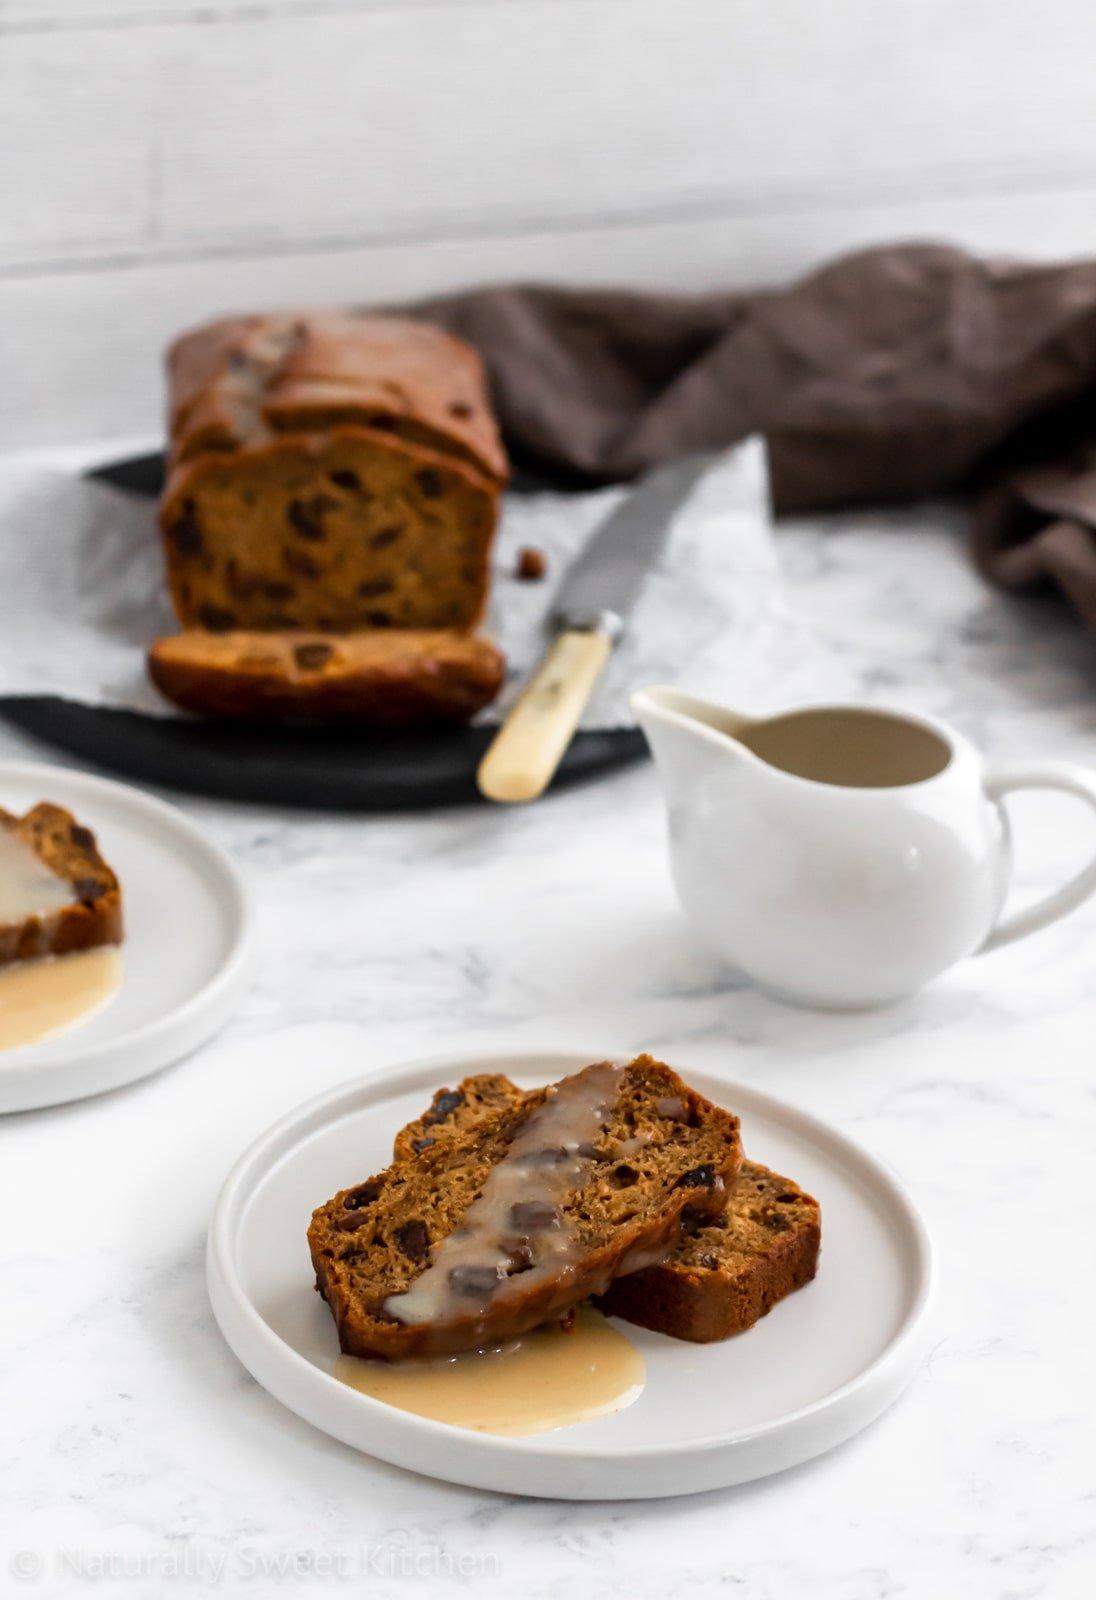 Rum and raisin banana bread topped with a sugar-free vanilla glaze.